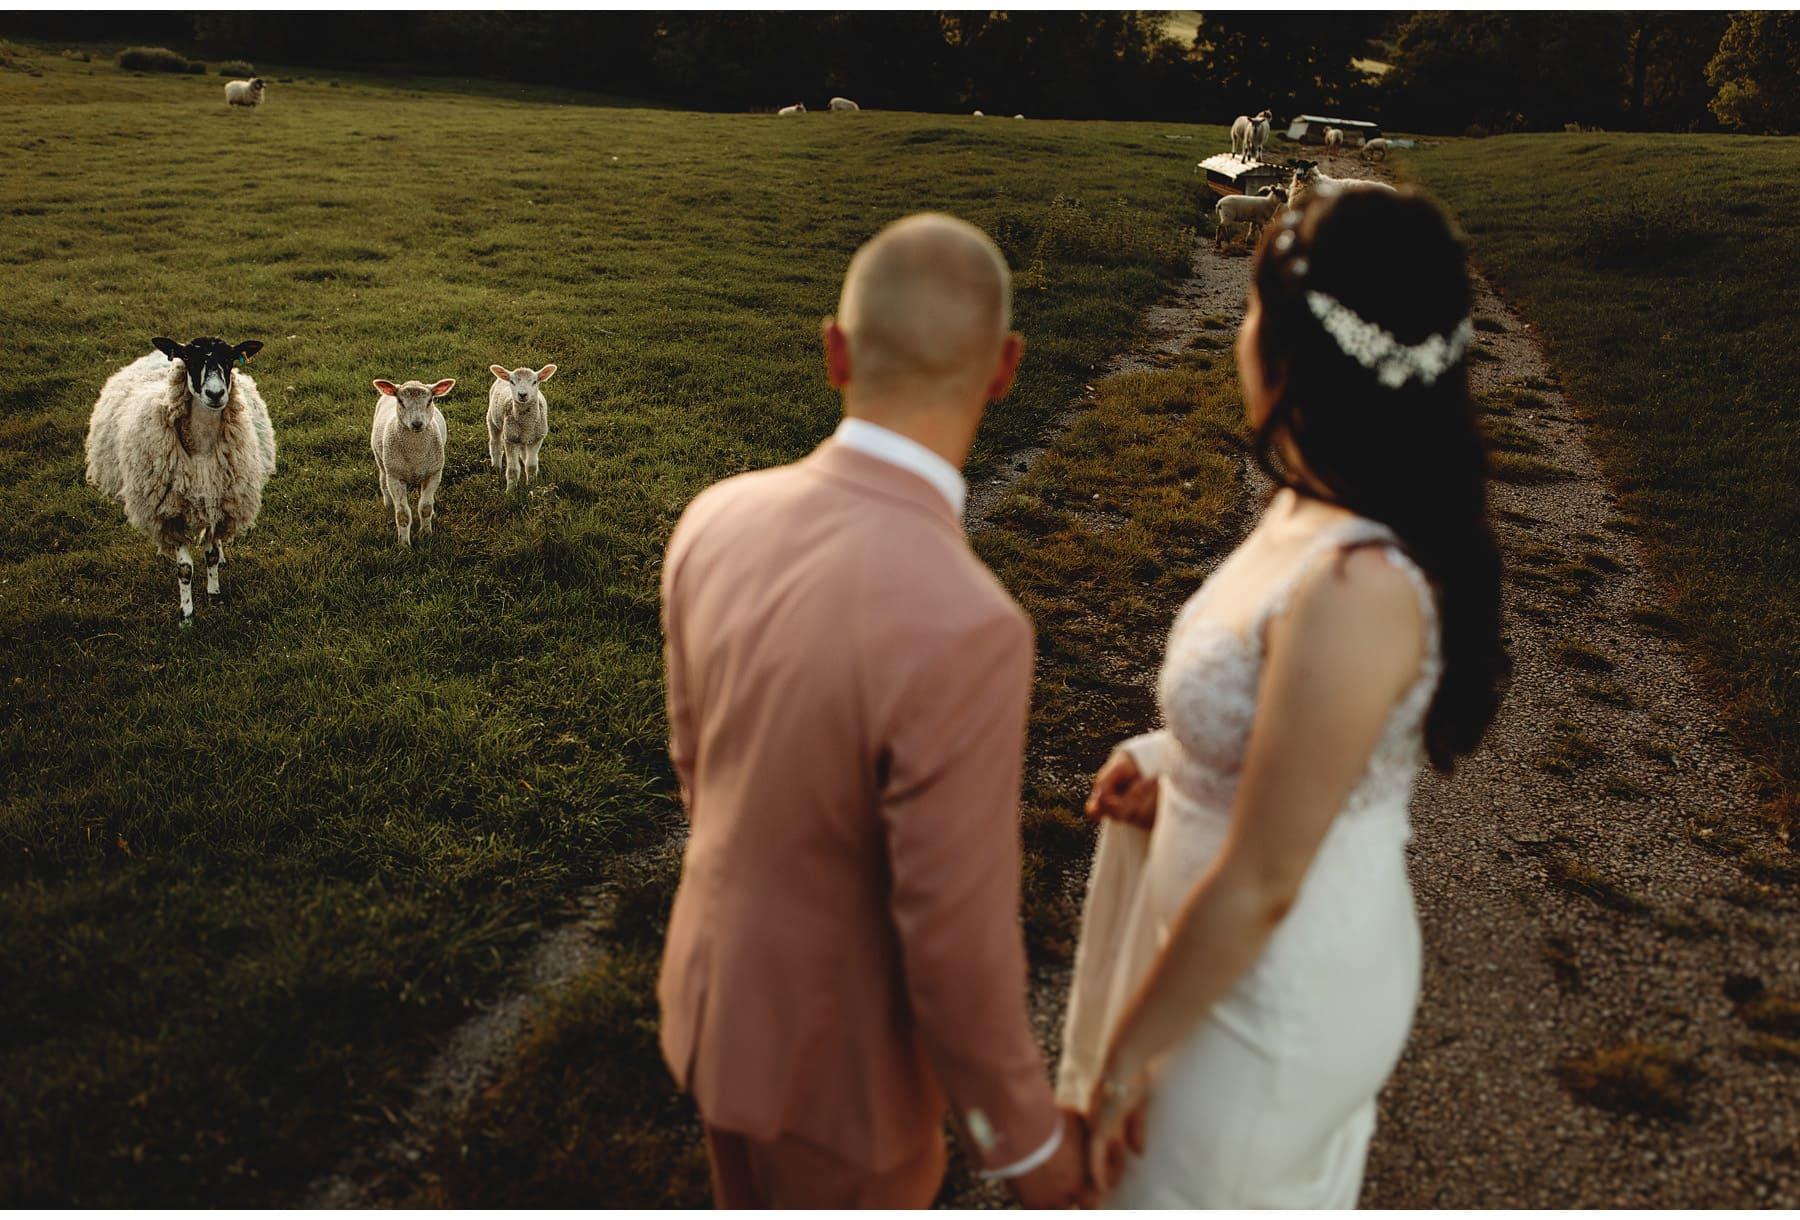 the bride & groom walking amongst the sheep